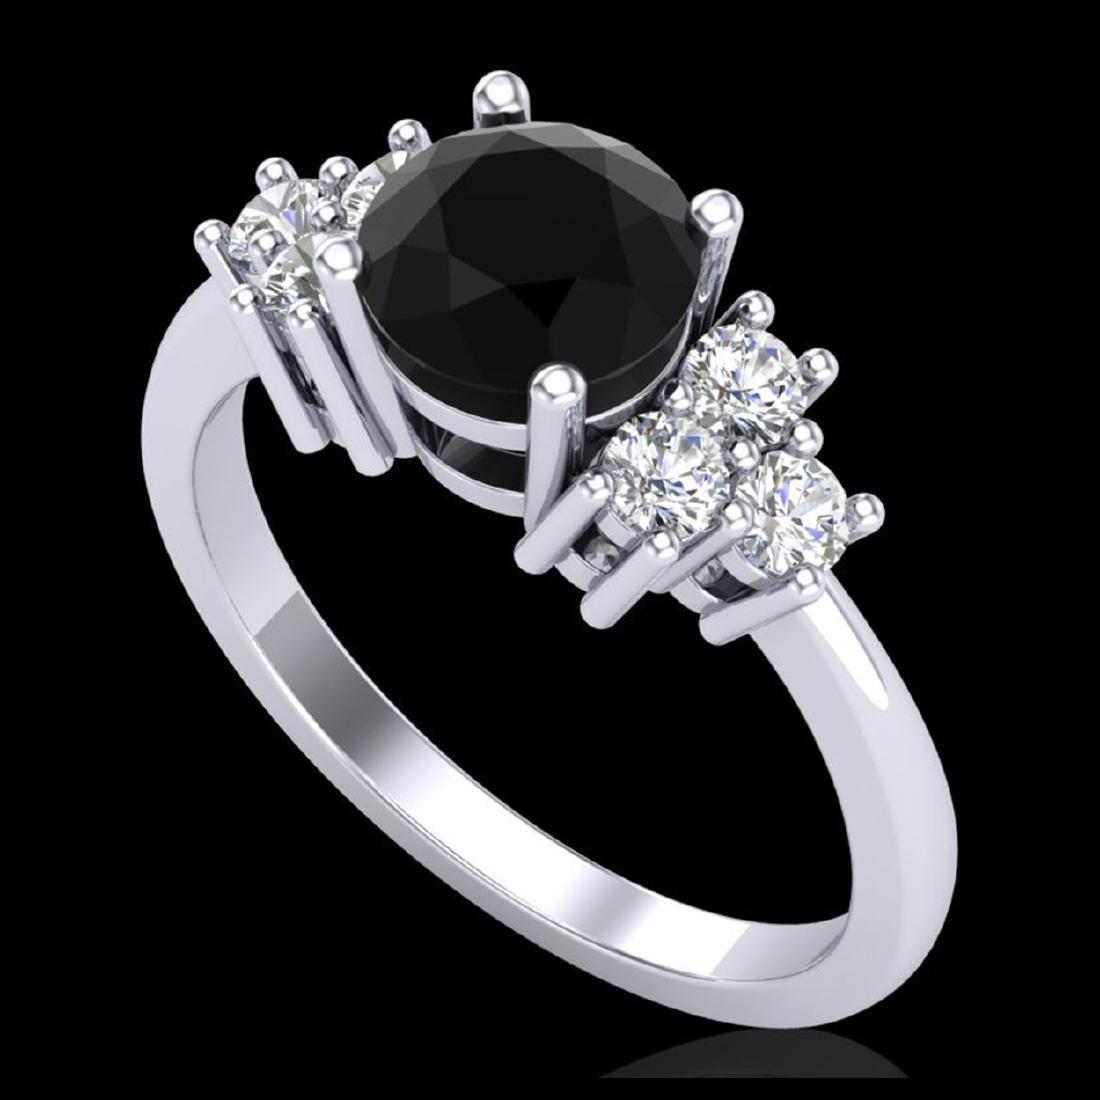 1.25 ctw Fancy Black Diamond Art Deco Ring 18K White